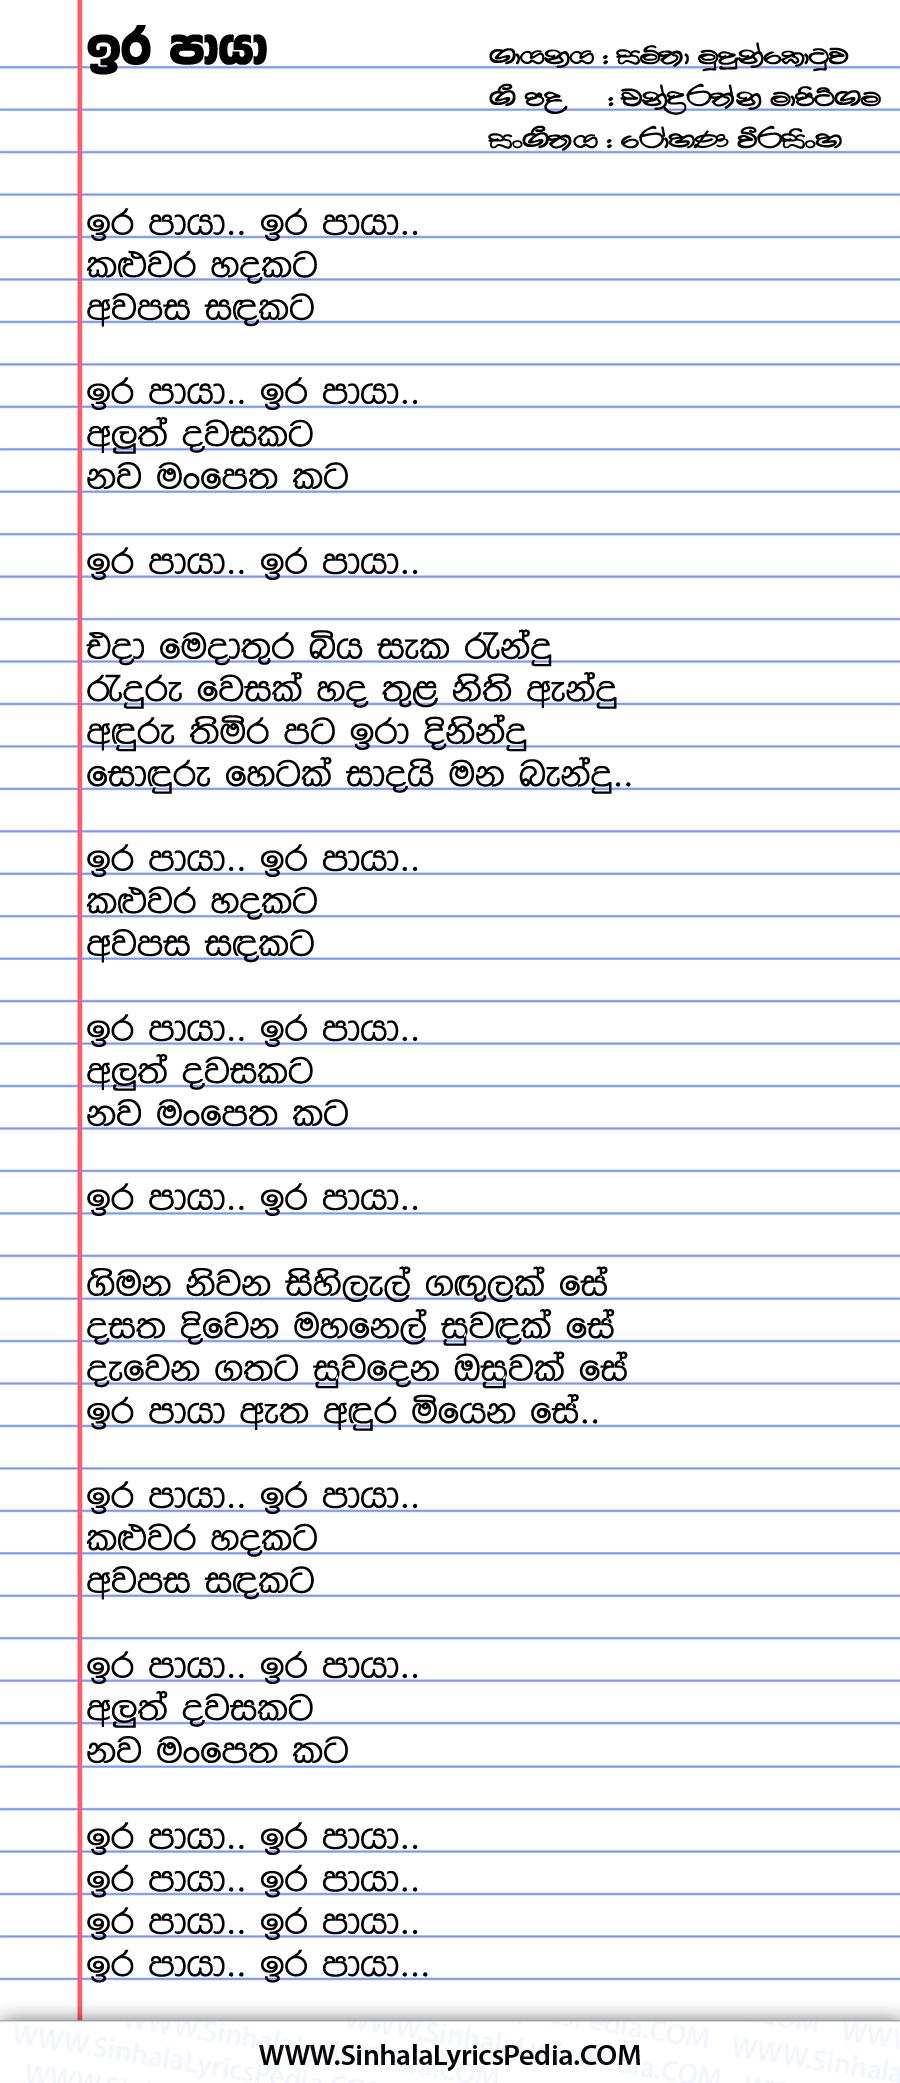 Ira Paya Ira Paya Song Lyrics